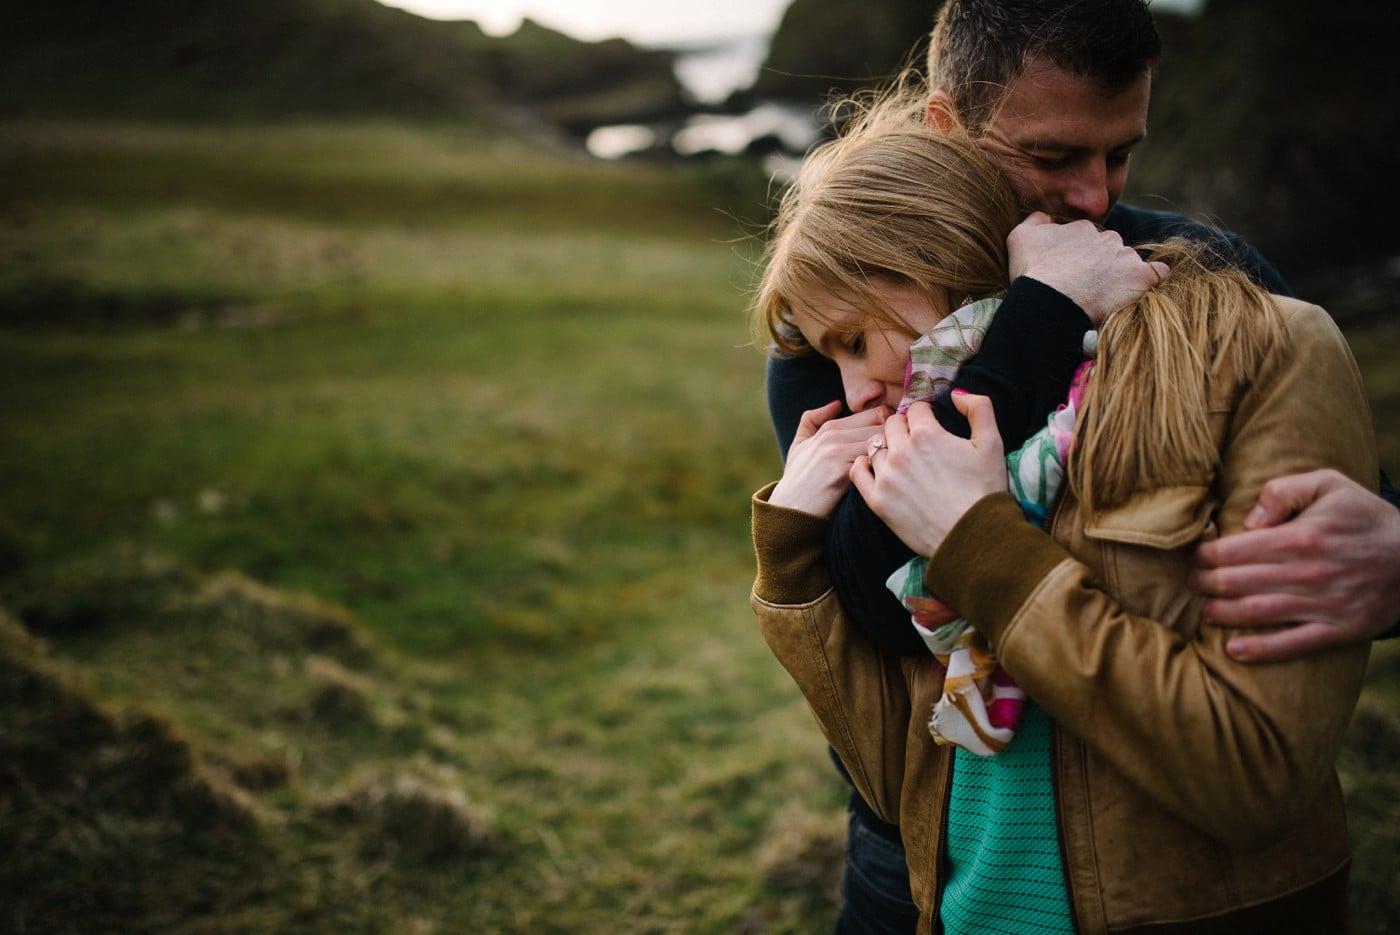 ballintoy-harbour-engagement-wedding-photographer-northern-ireland_0019